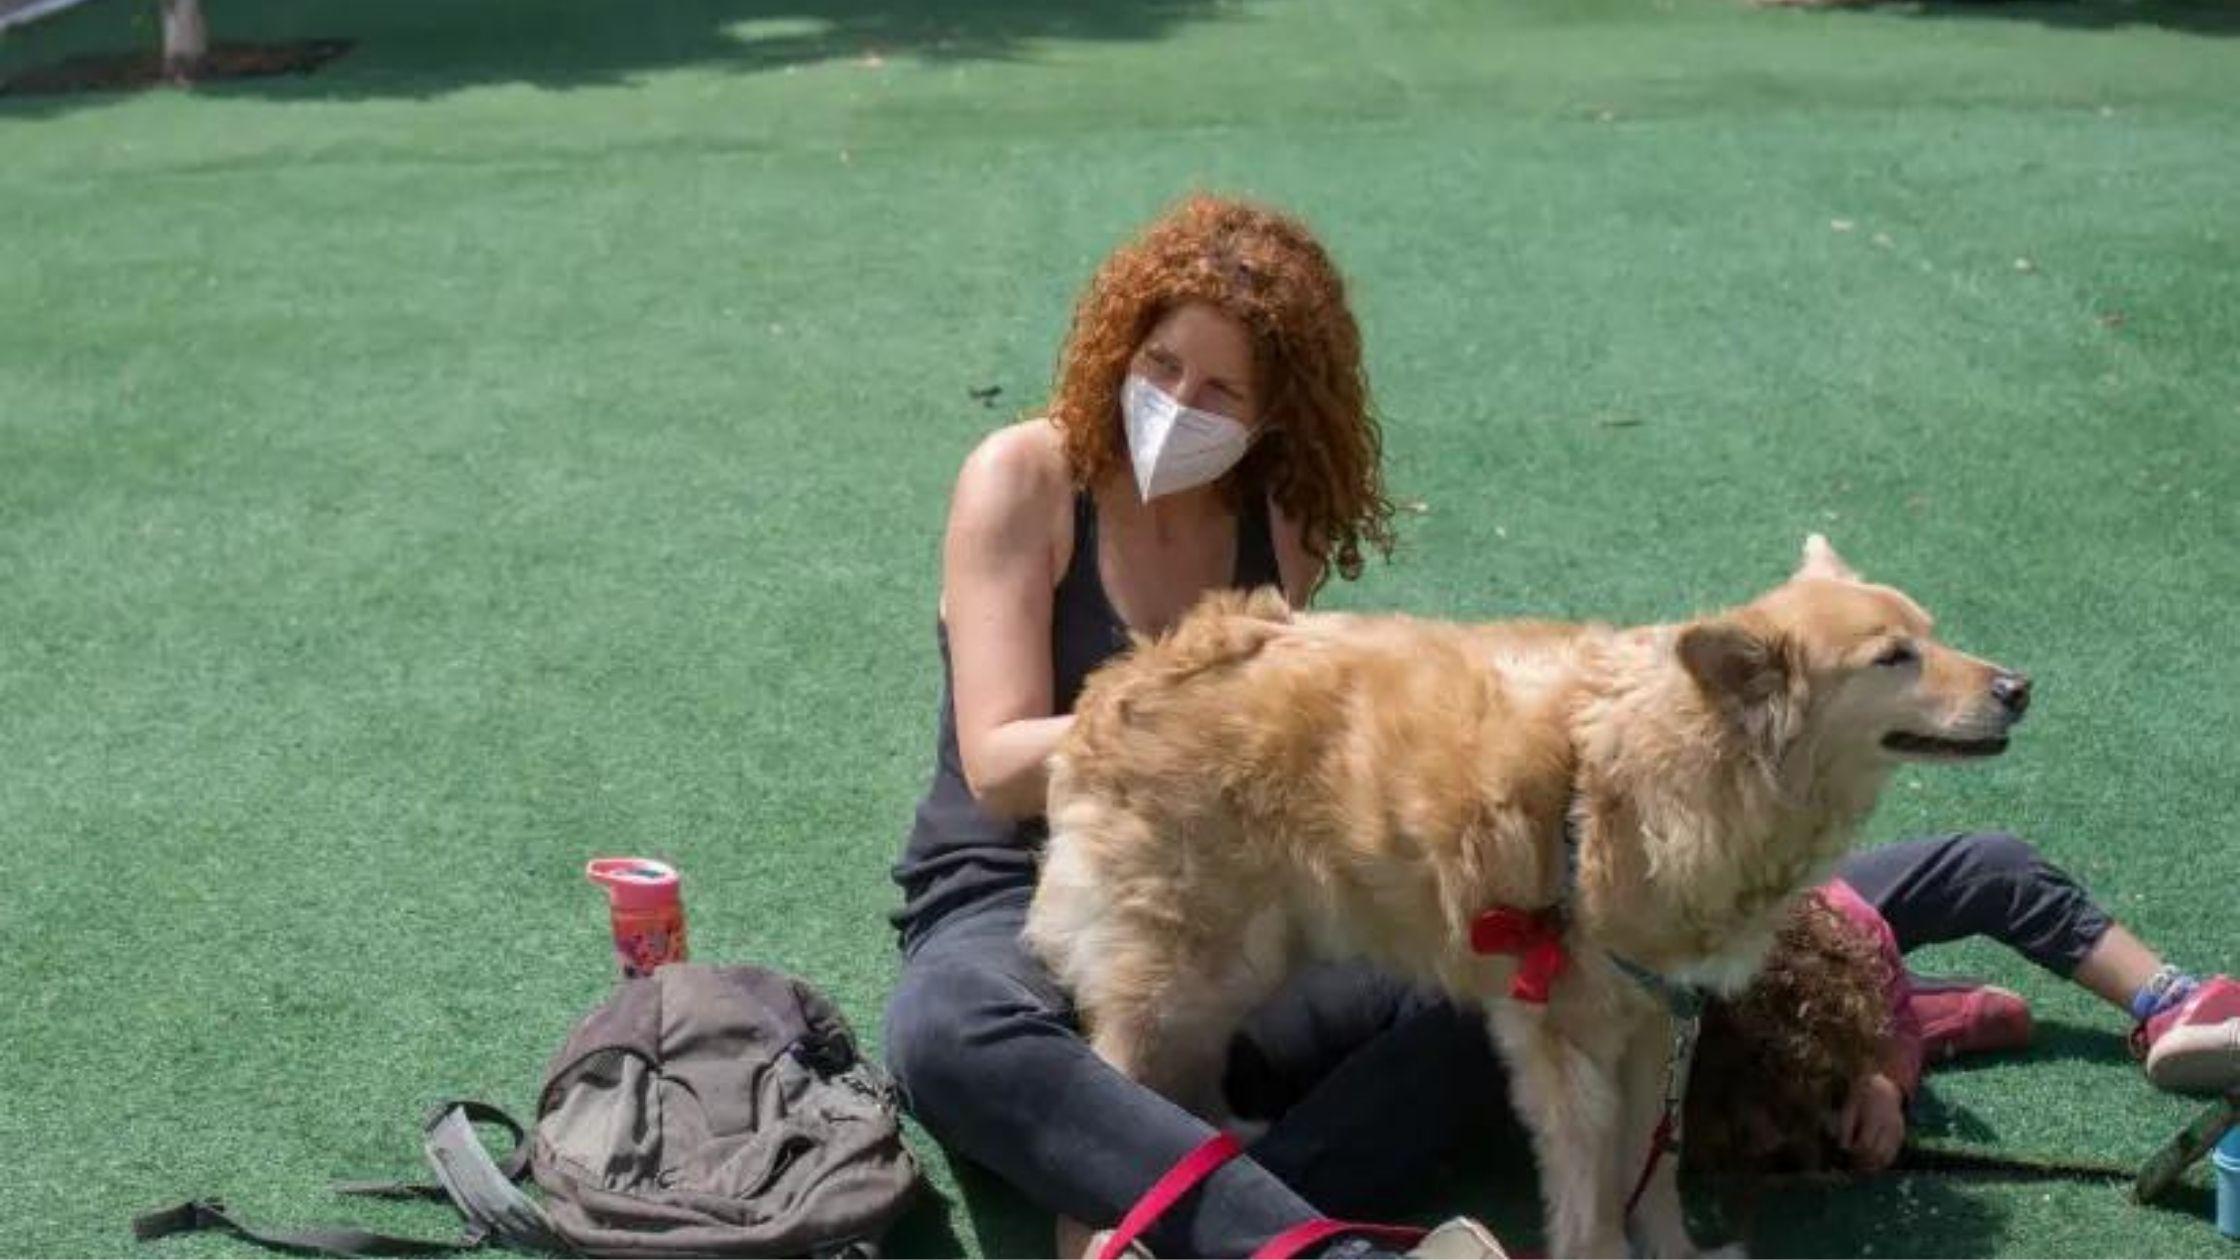 Registering Pet Dog's DNA Becomes Mandatory in Tel Aviv, Israel